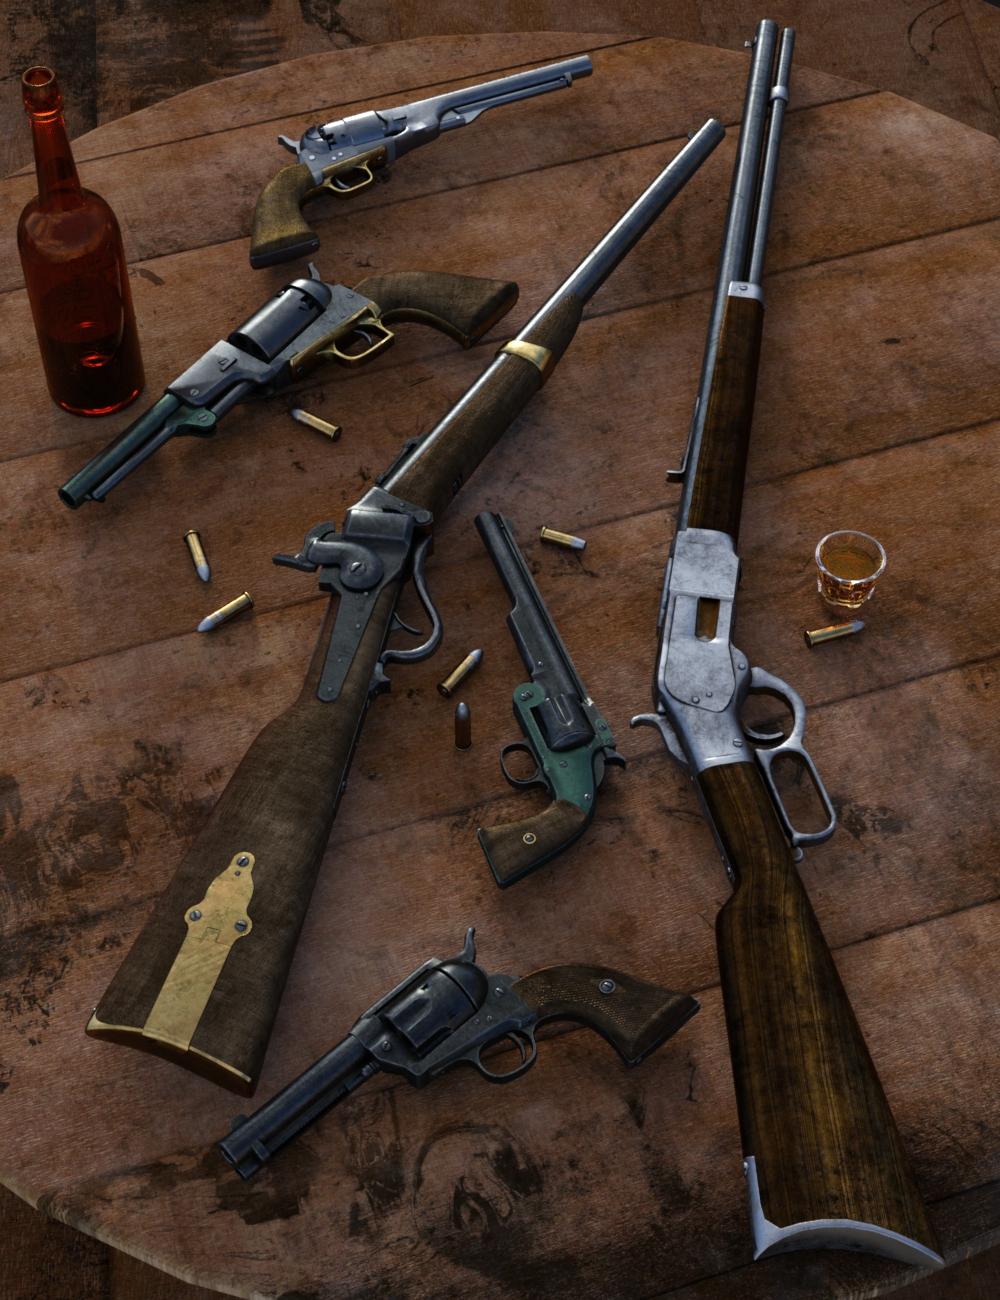 Old West Firearms Vol 1 by: DzFire, 3D Models by Daz 3D